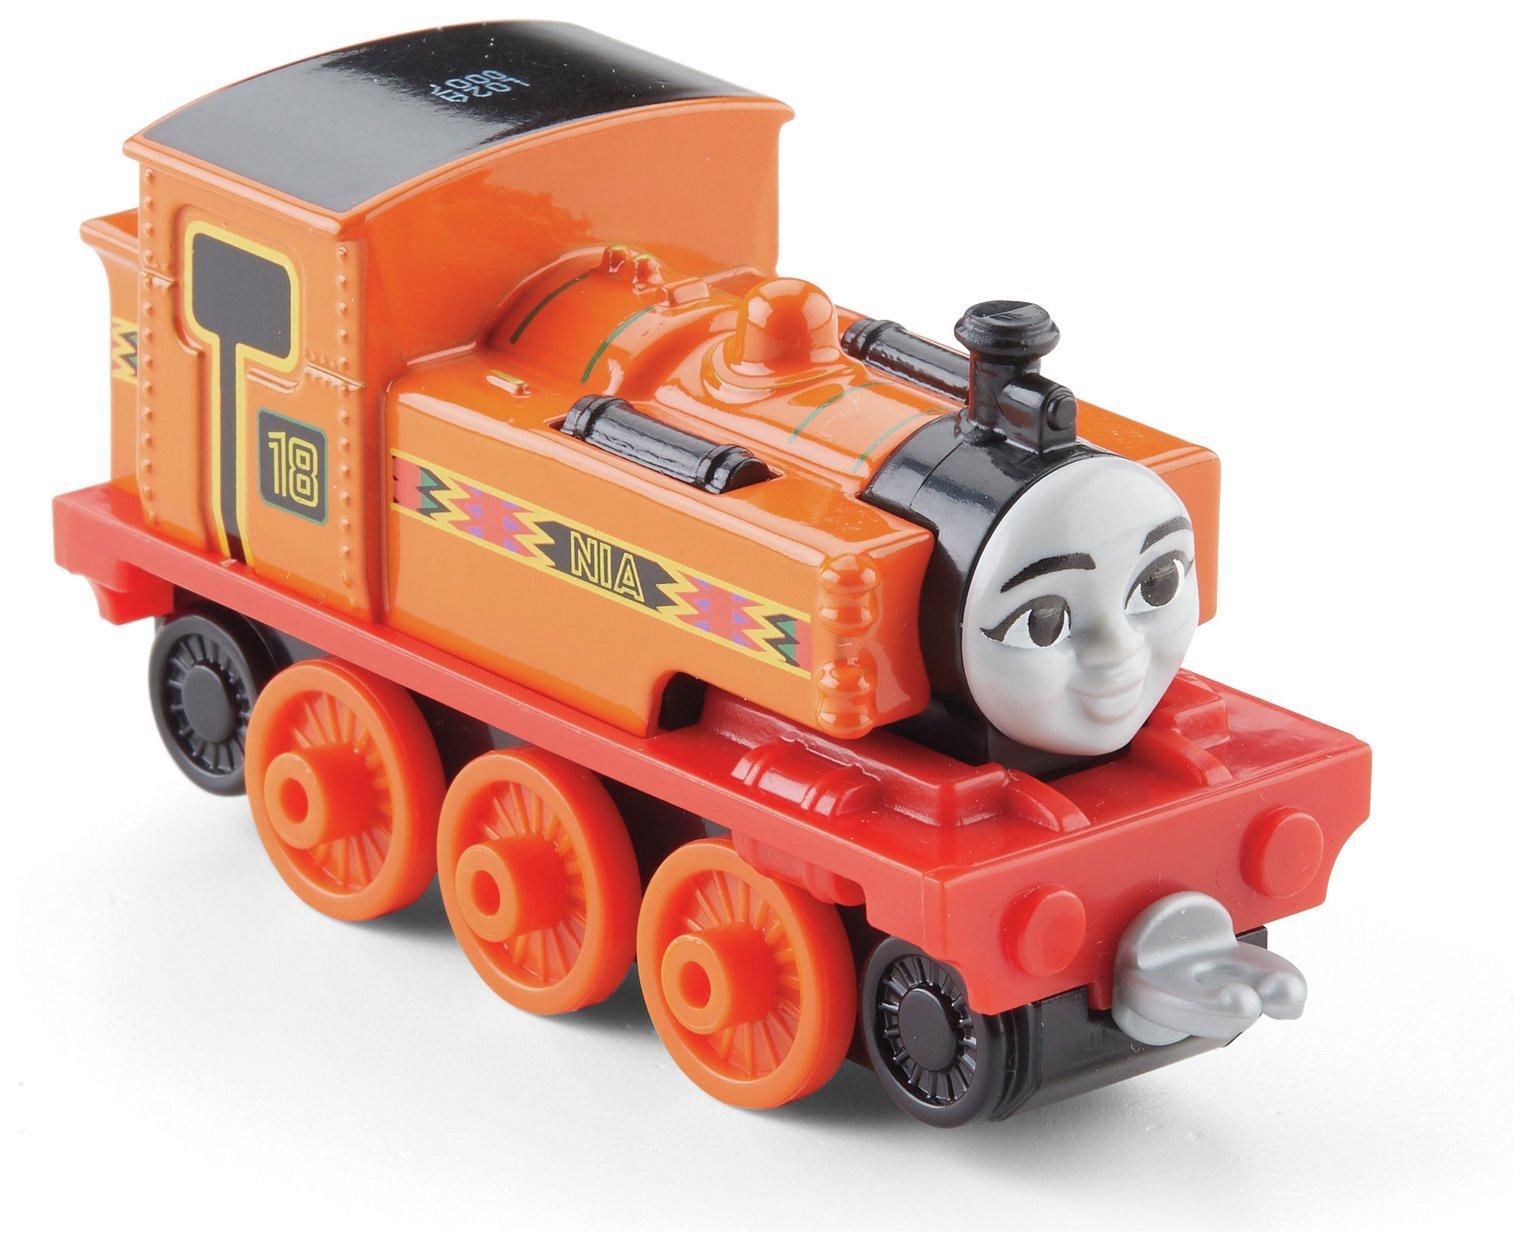 Thomas & Friends Adventures Nia